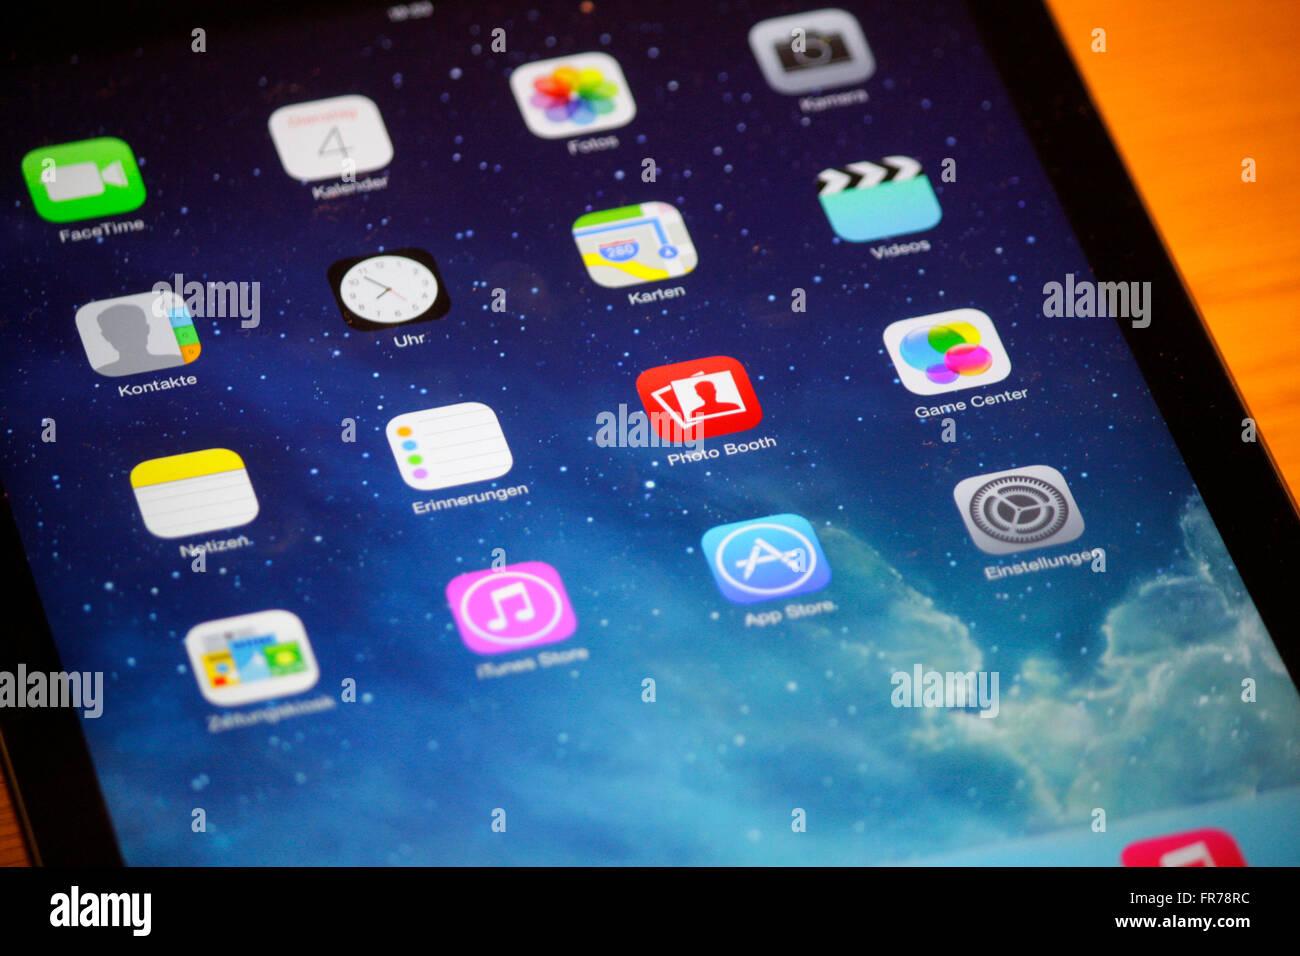 Apps auf einem IPAD der Firma 'Apple', en Berlín. Imagen De Stock